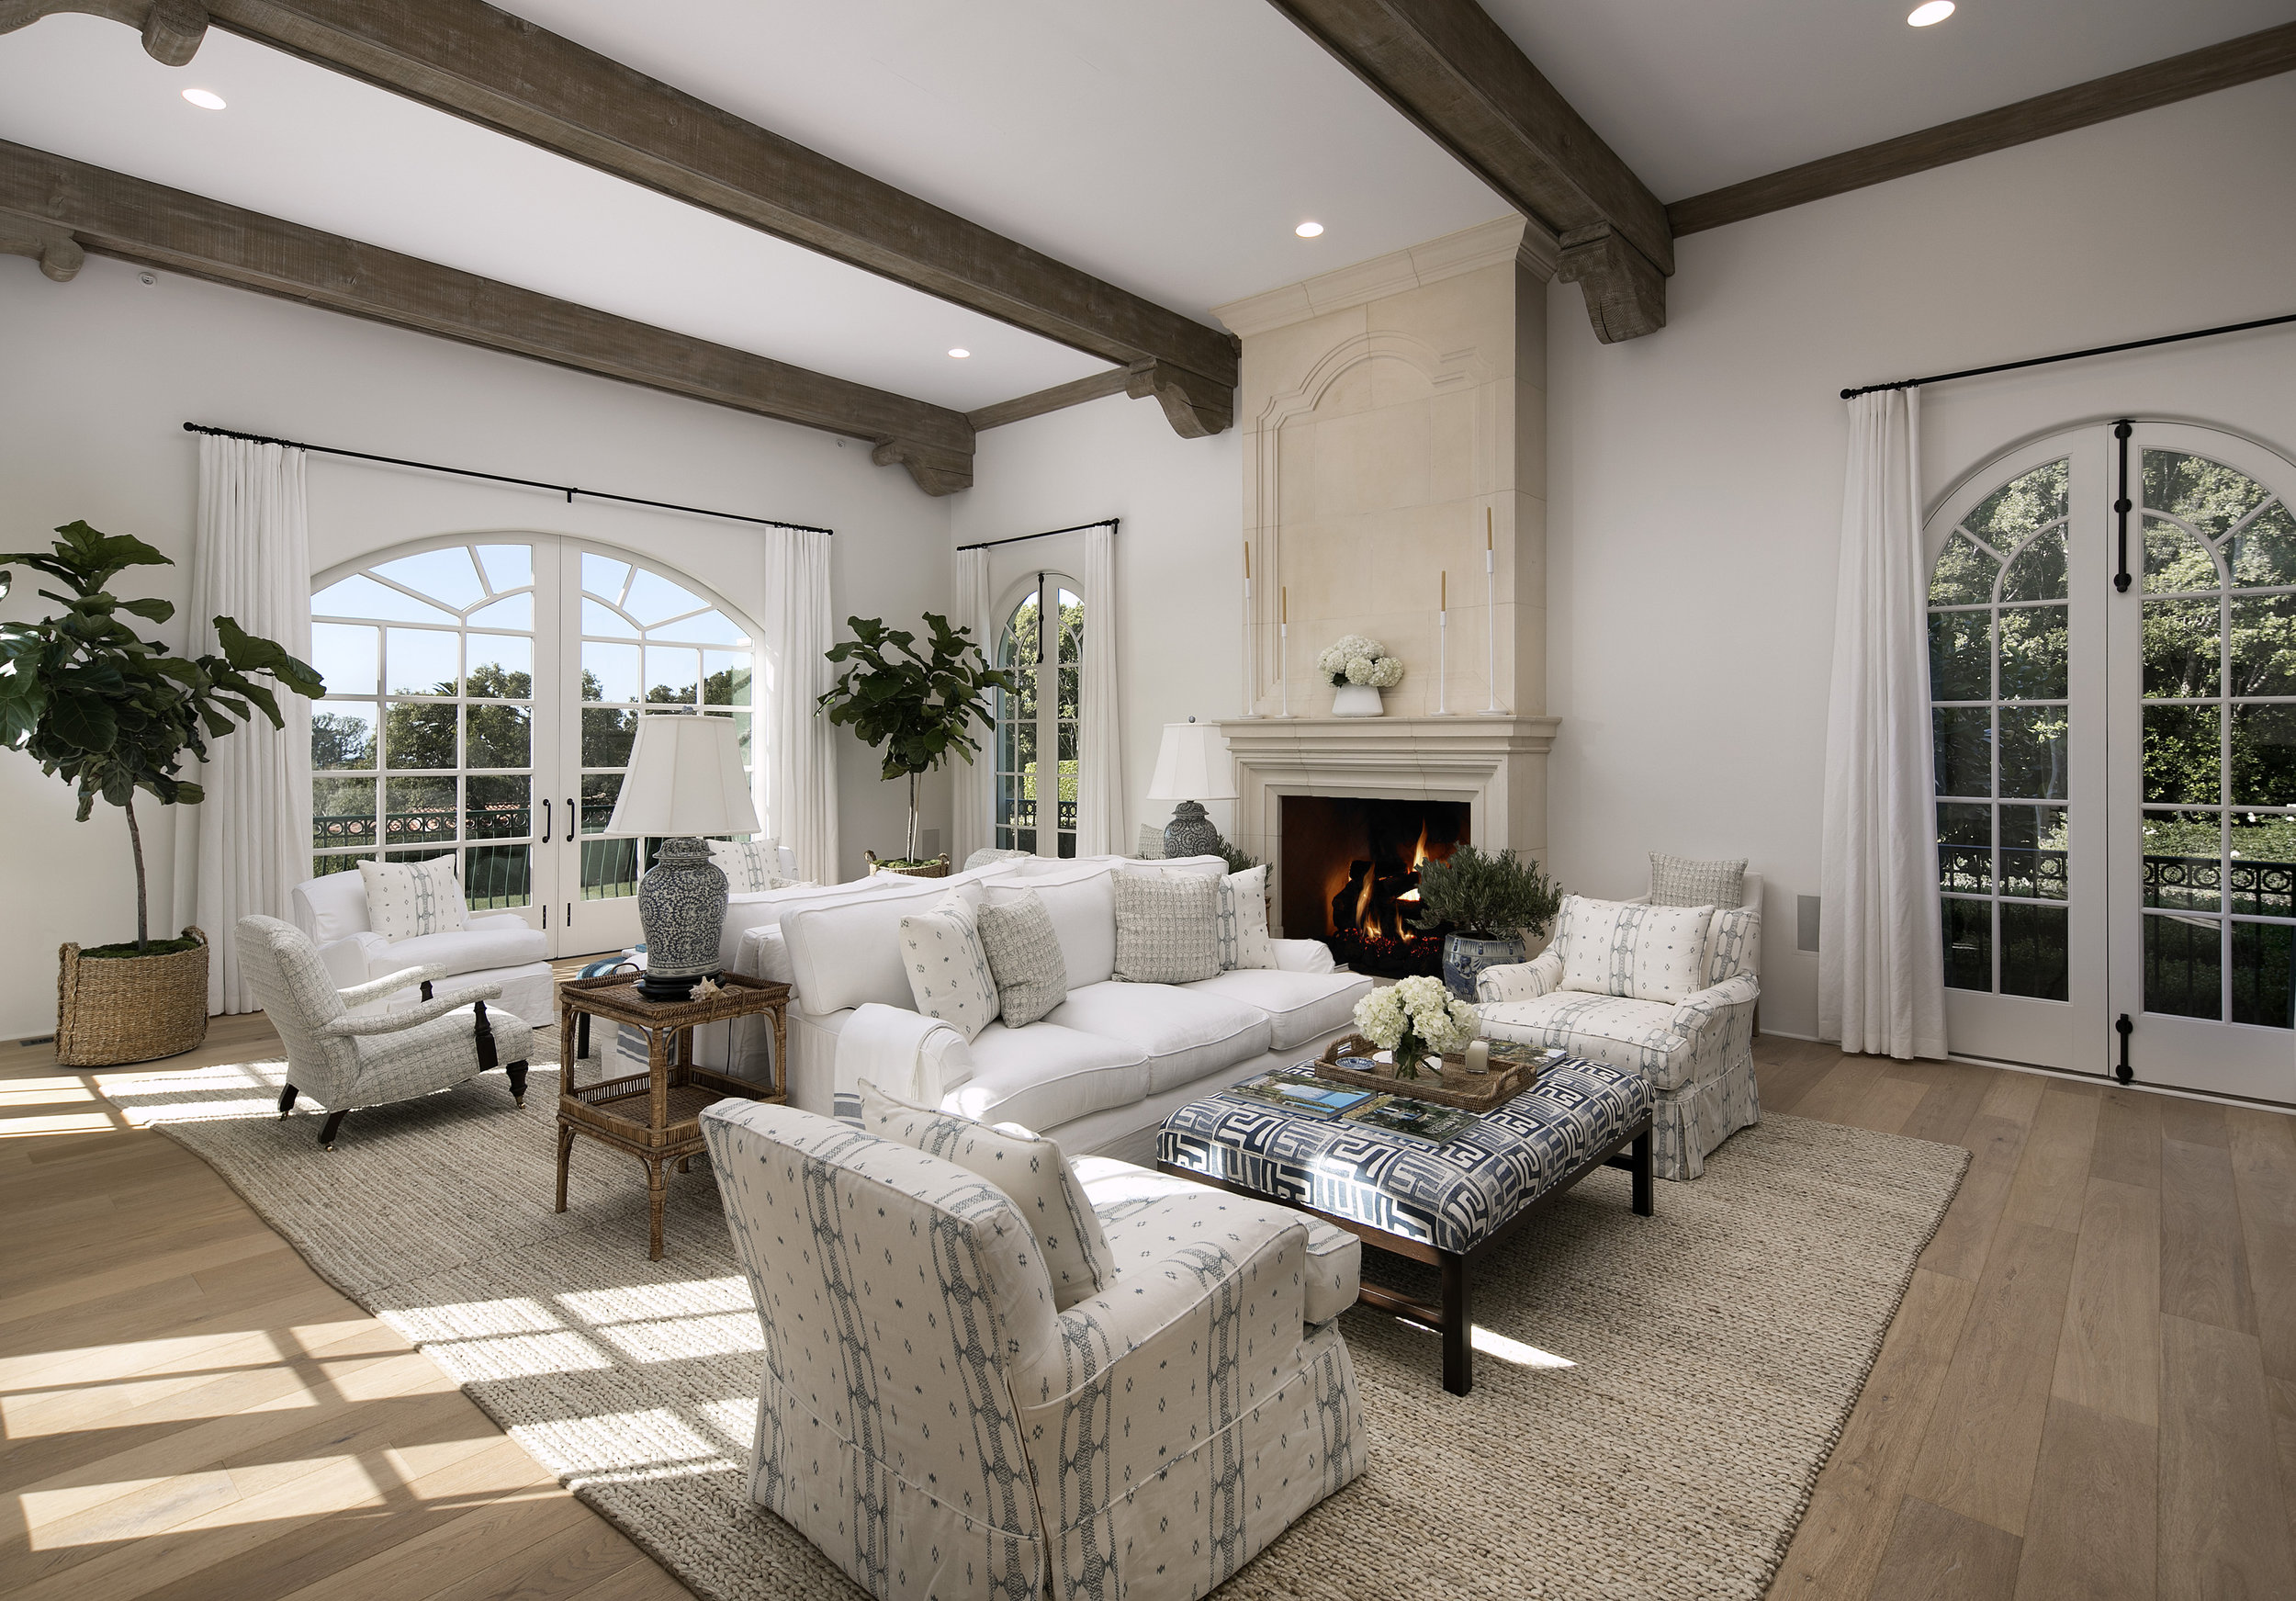 Rooms+Gardens+Interior+Design+Brighton-chair.jpeg